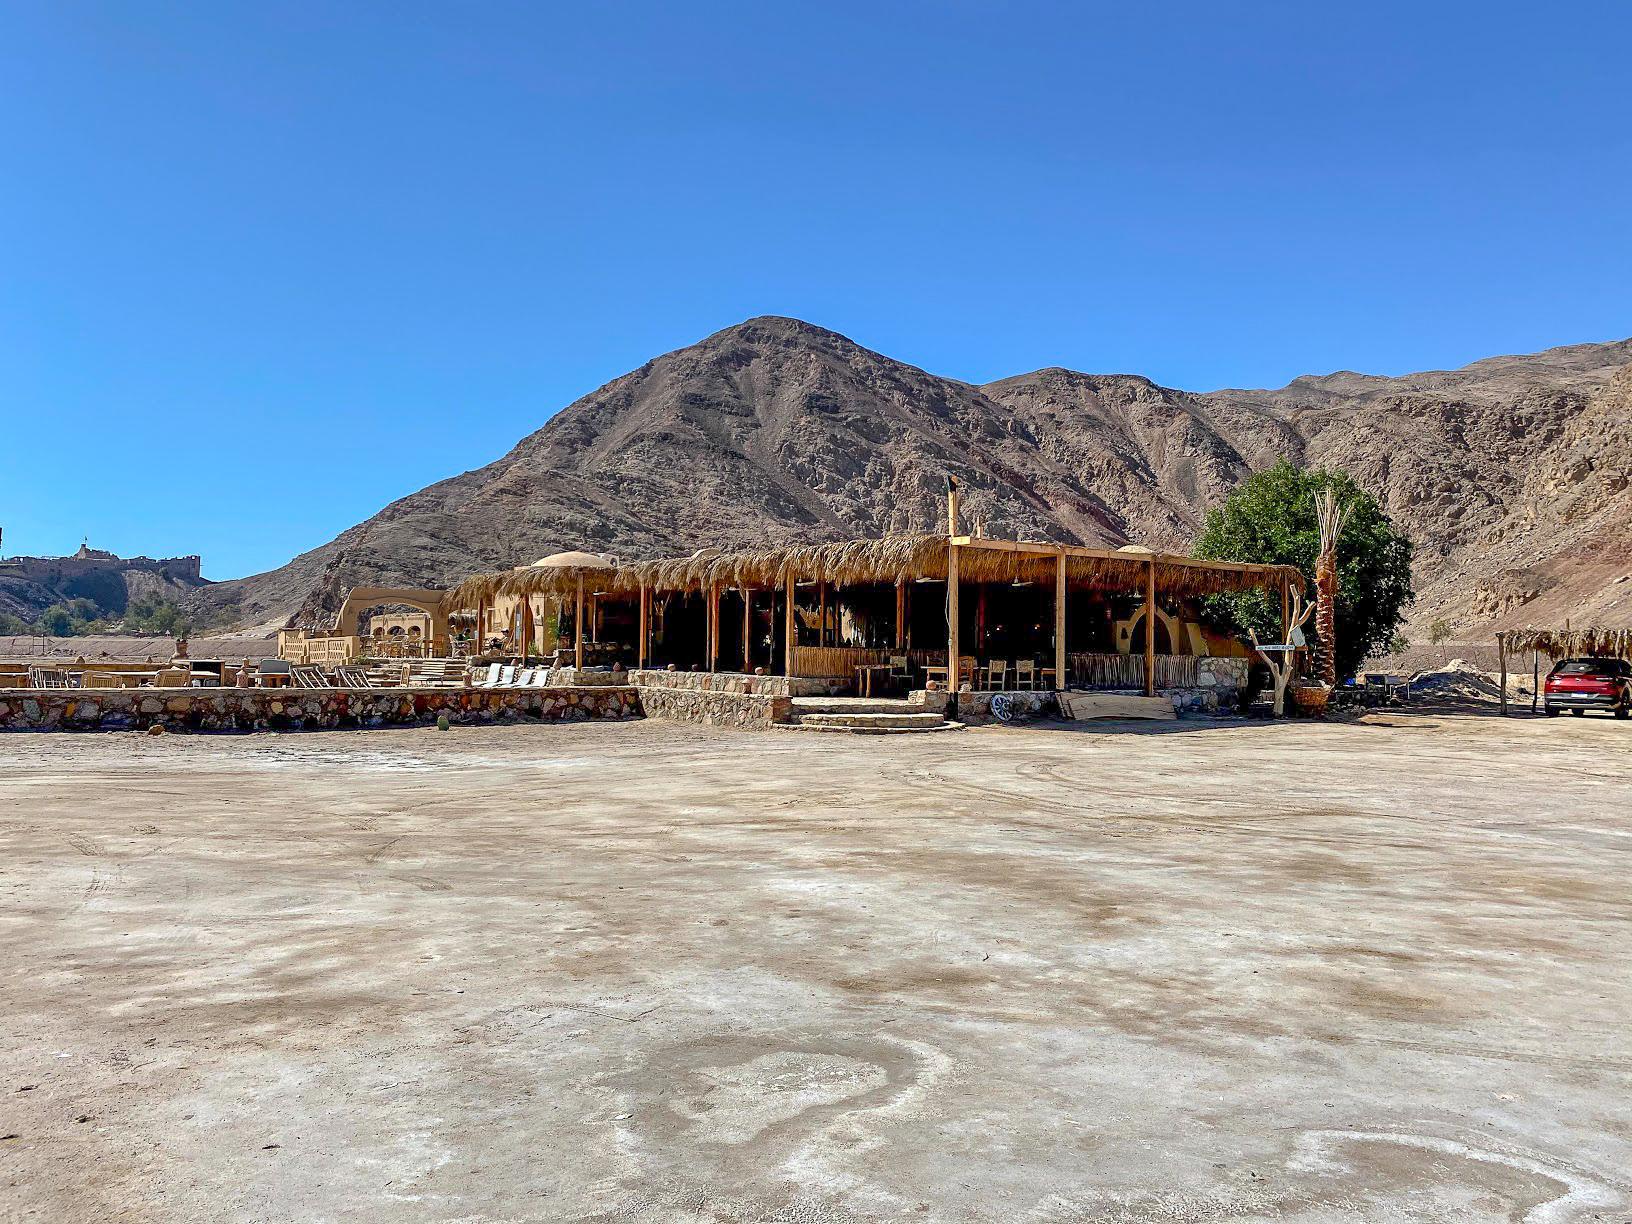 The restaurant/reception building at Aqua Sun, Gulf of Aqaba, Egypt